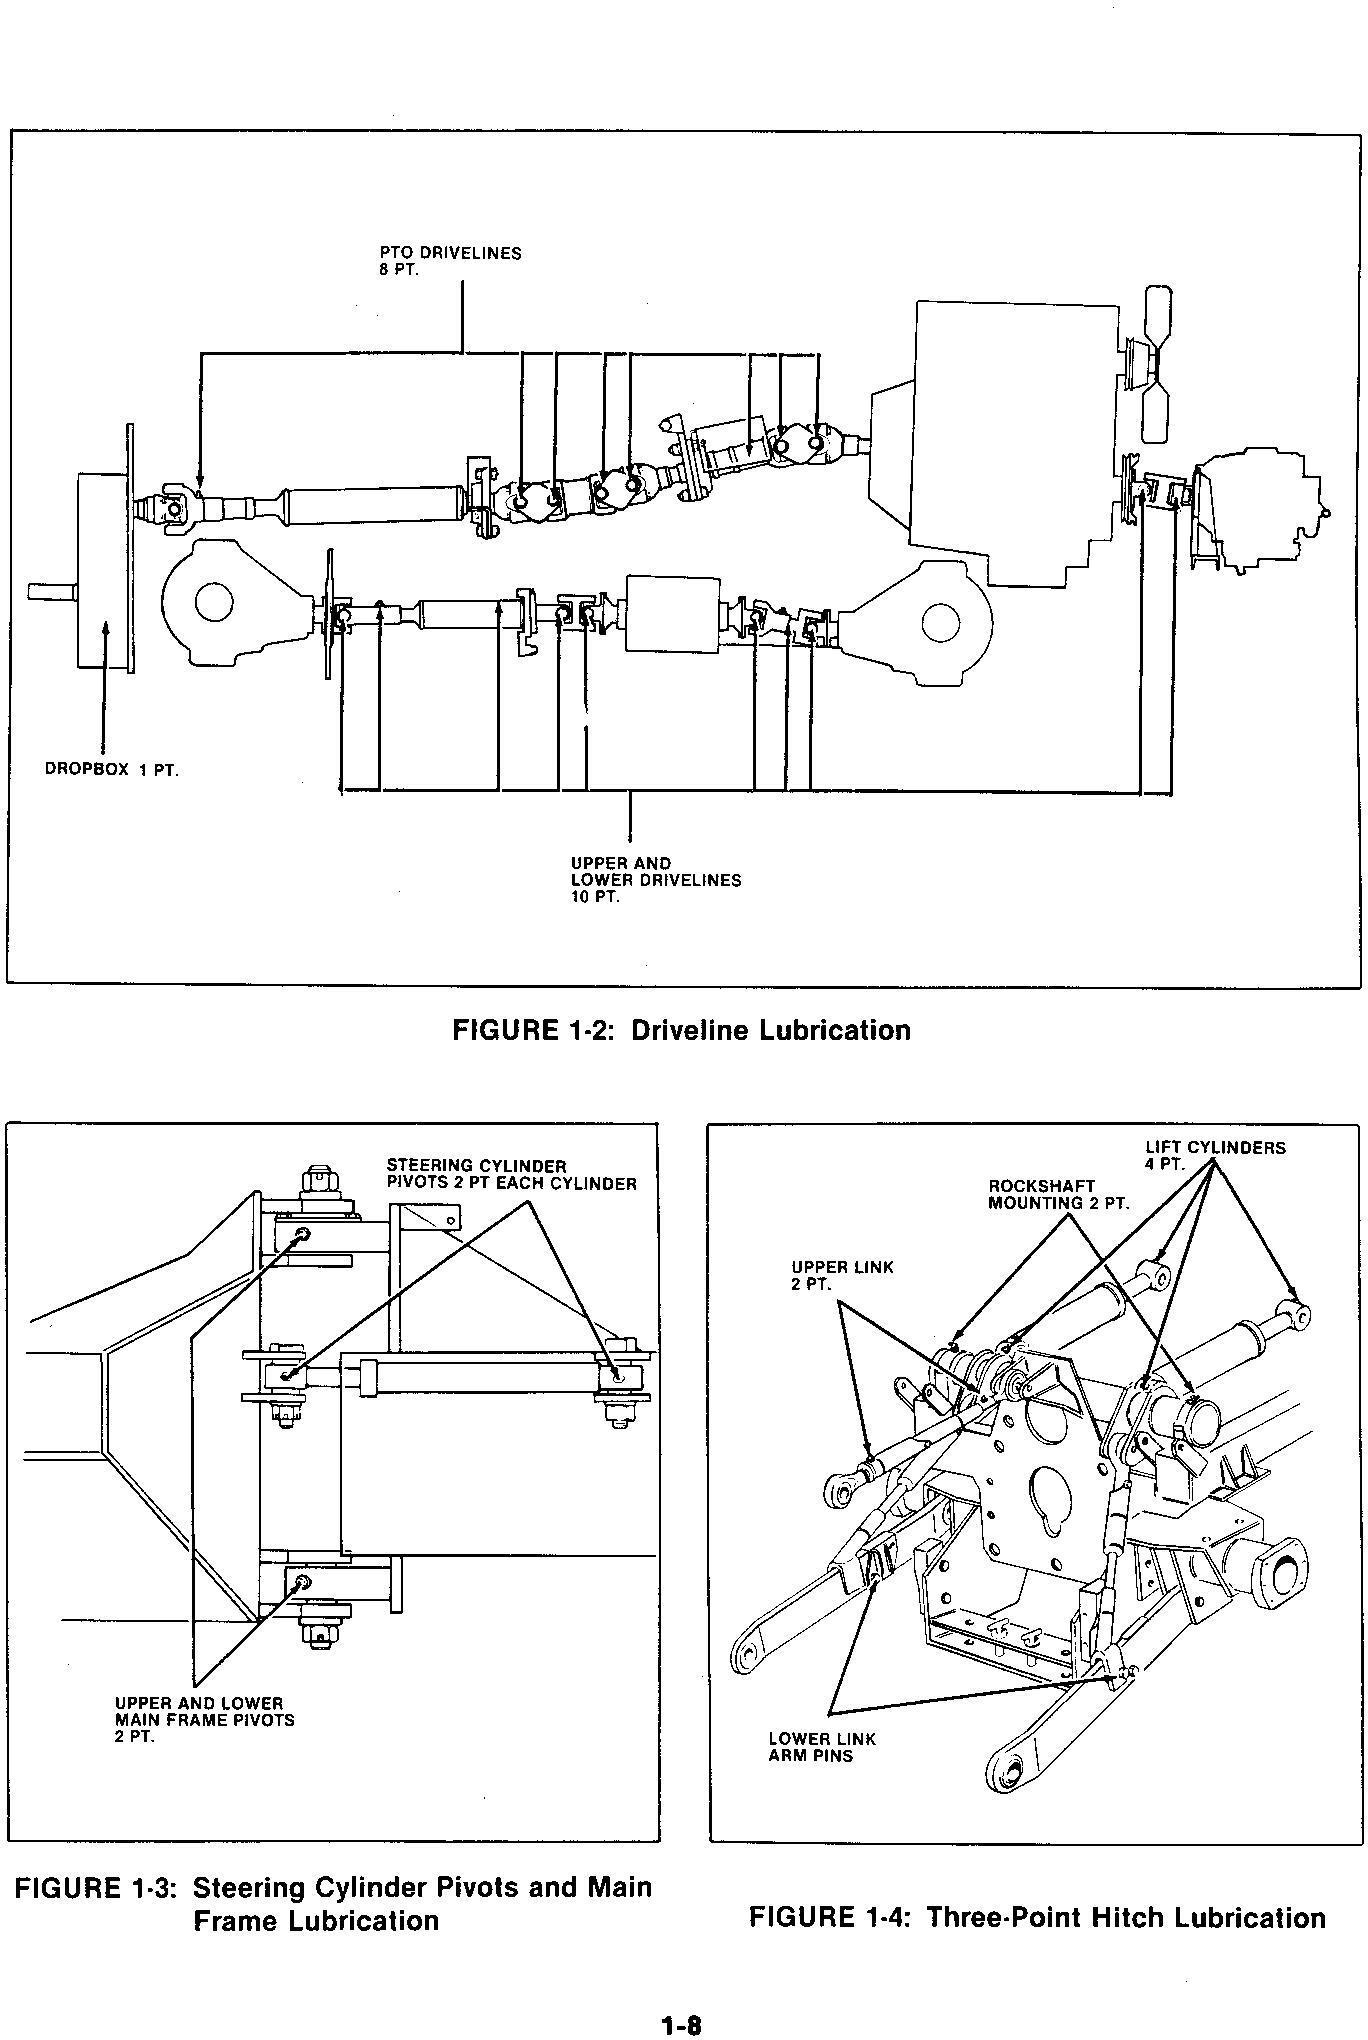 New Holland Versatile 150, 160 4WD Tractors (1977-1983) Service Repair Manual - 1